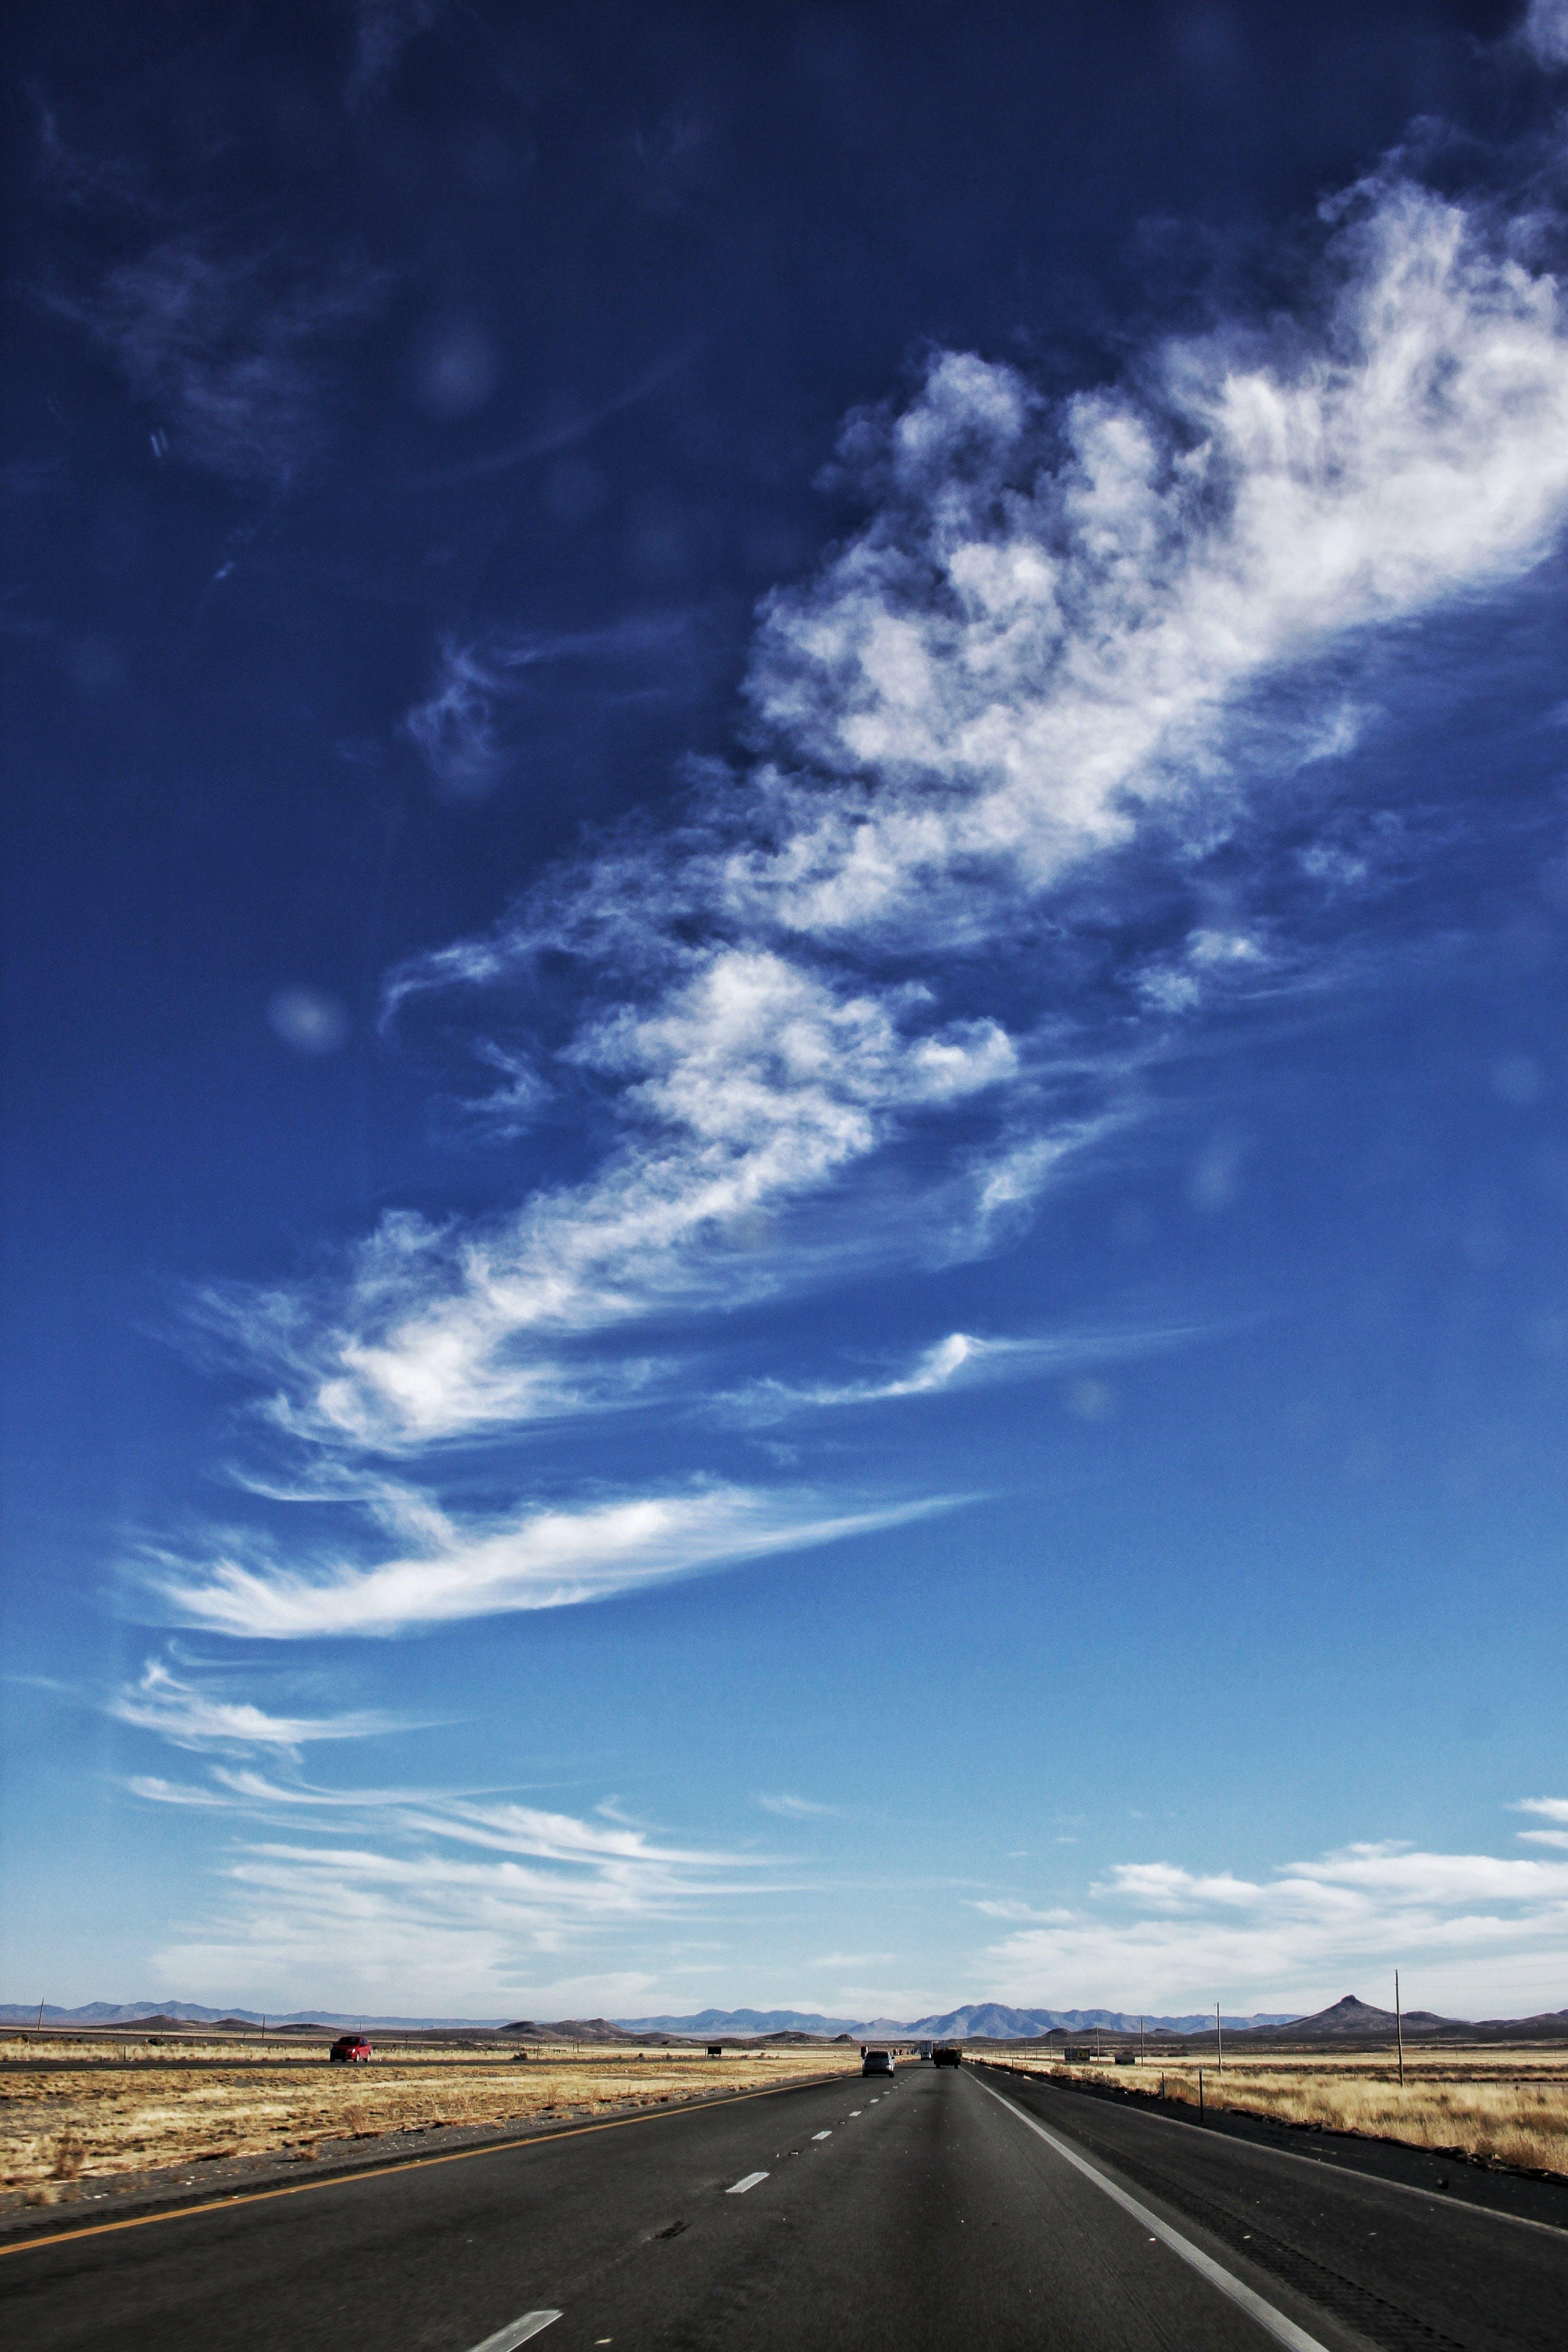 Cirrus Clouds over Empty Black Road